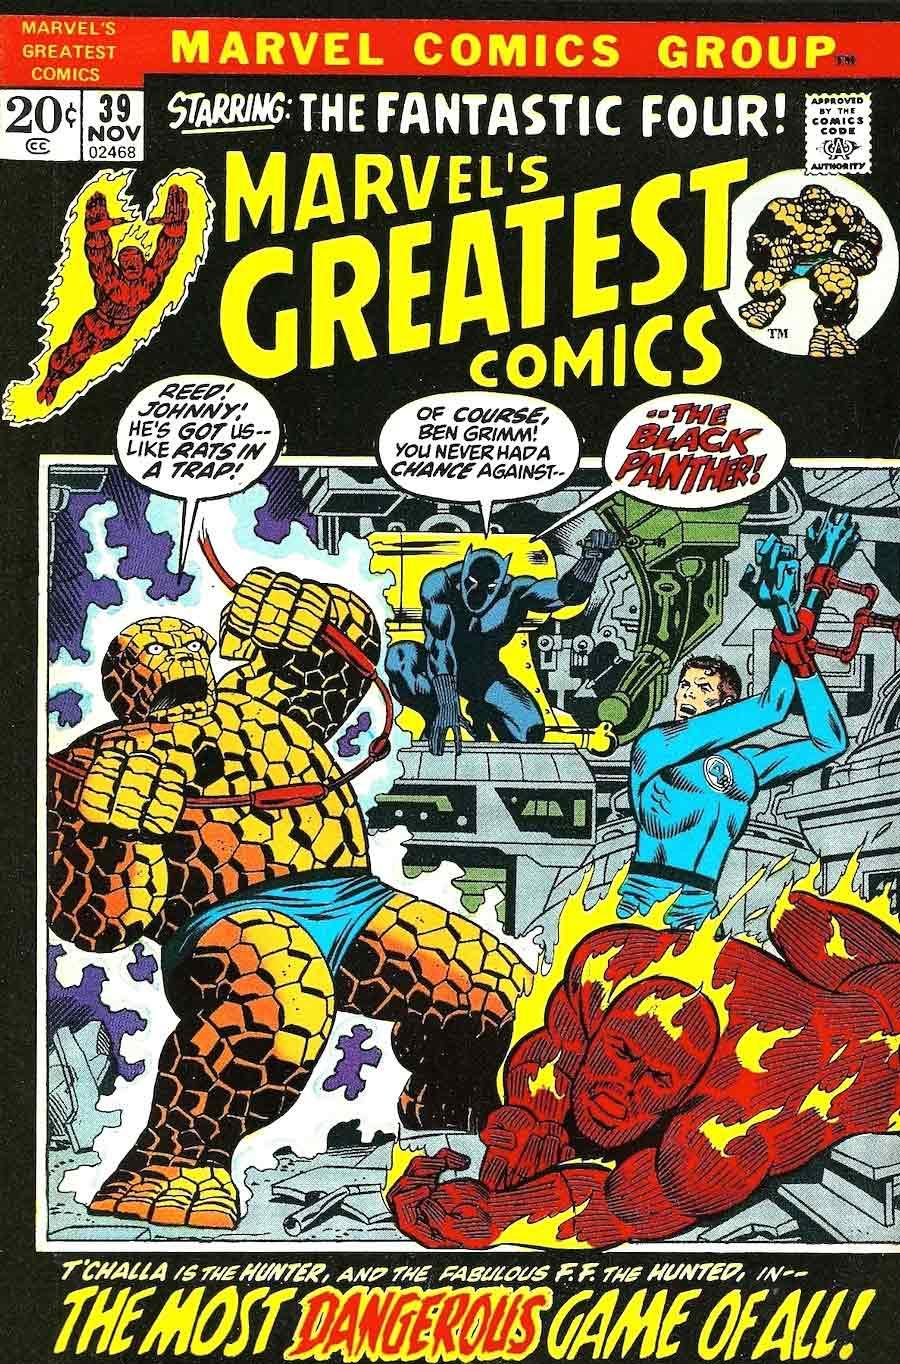 Marvel's-Greatest-Comics-03